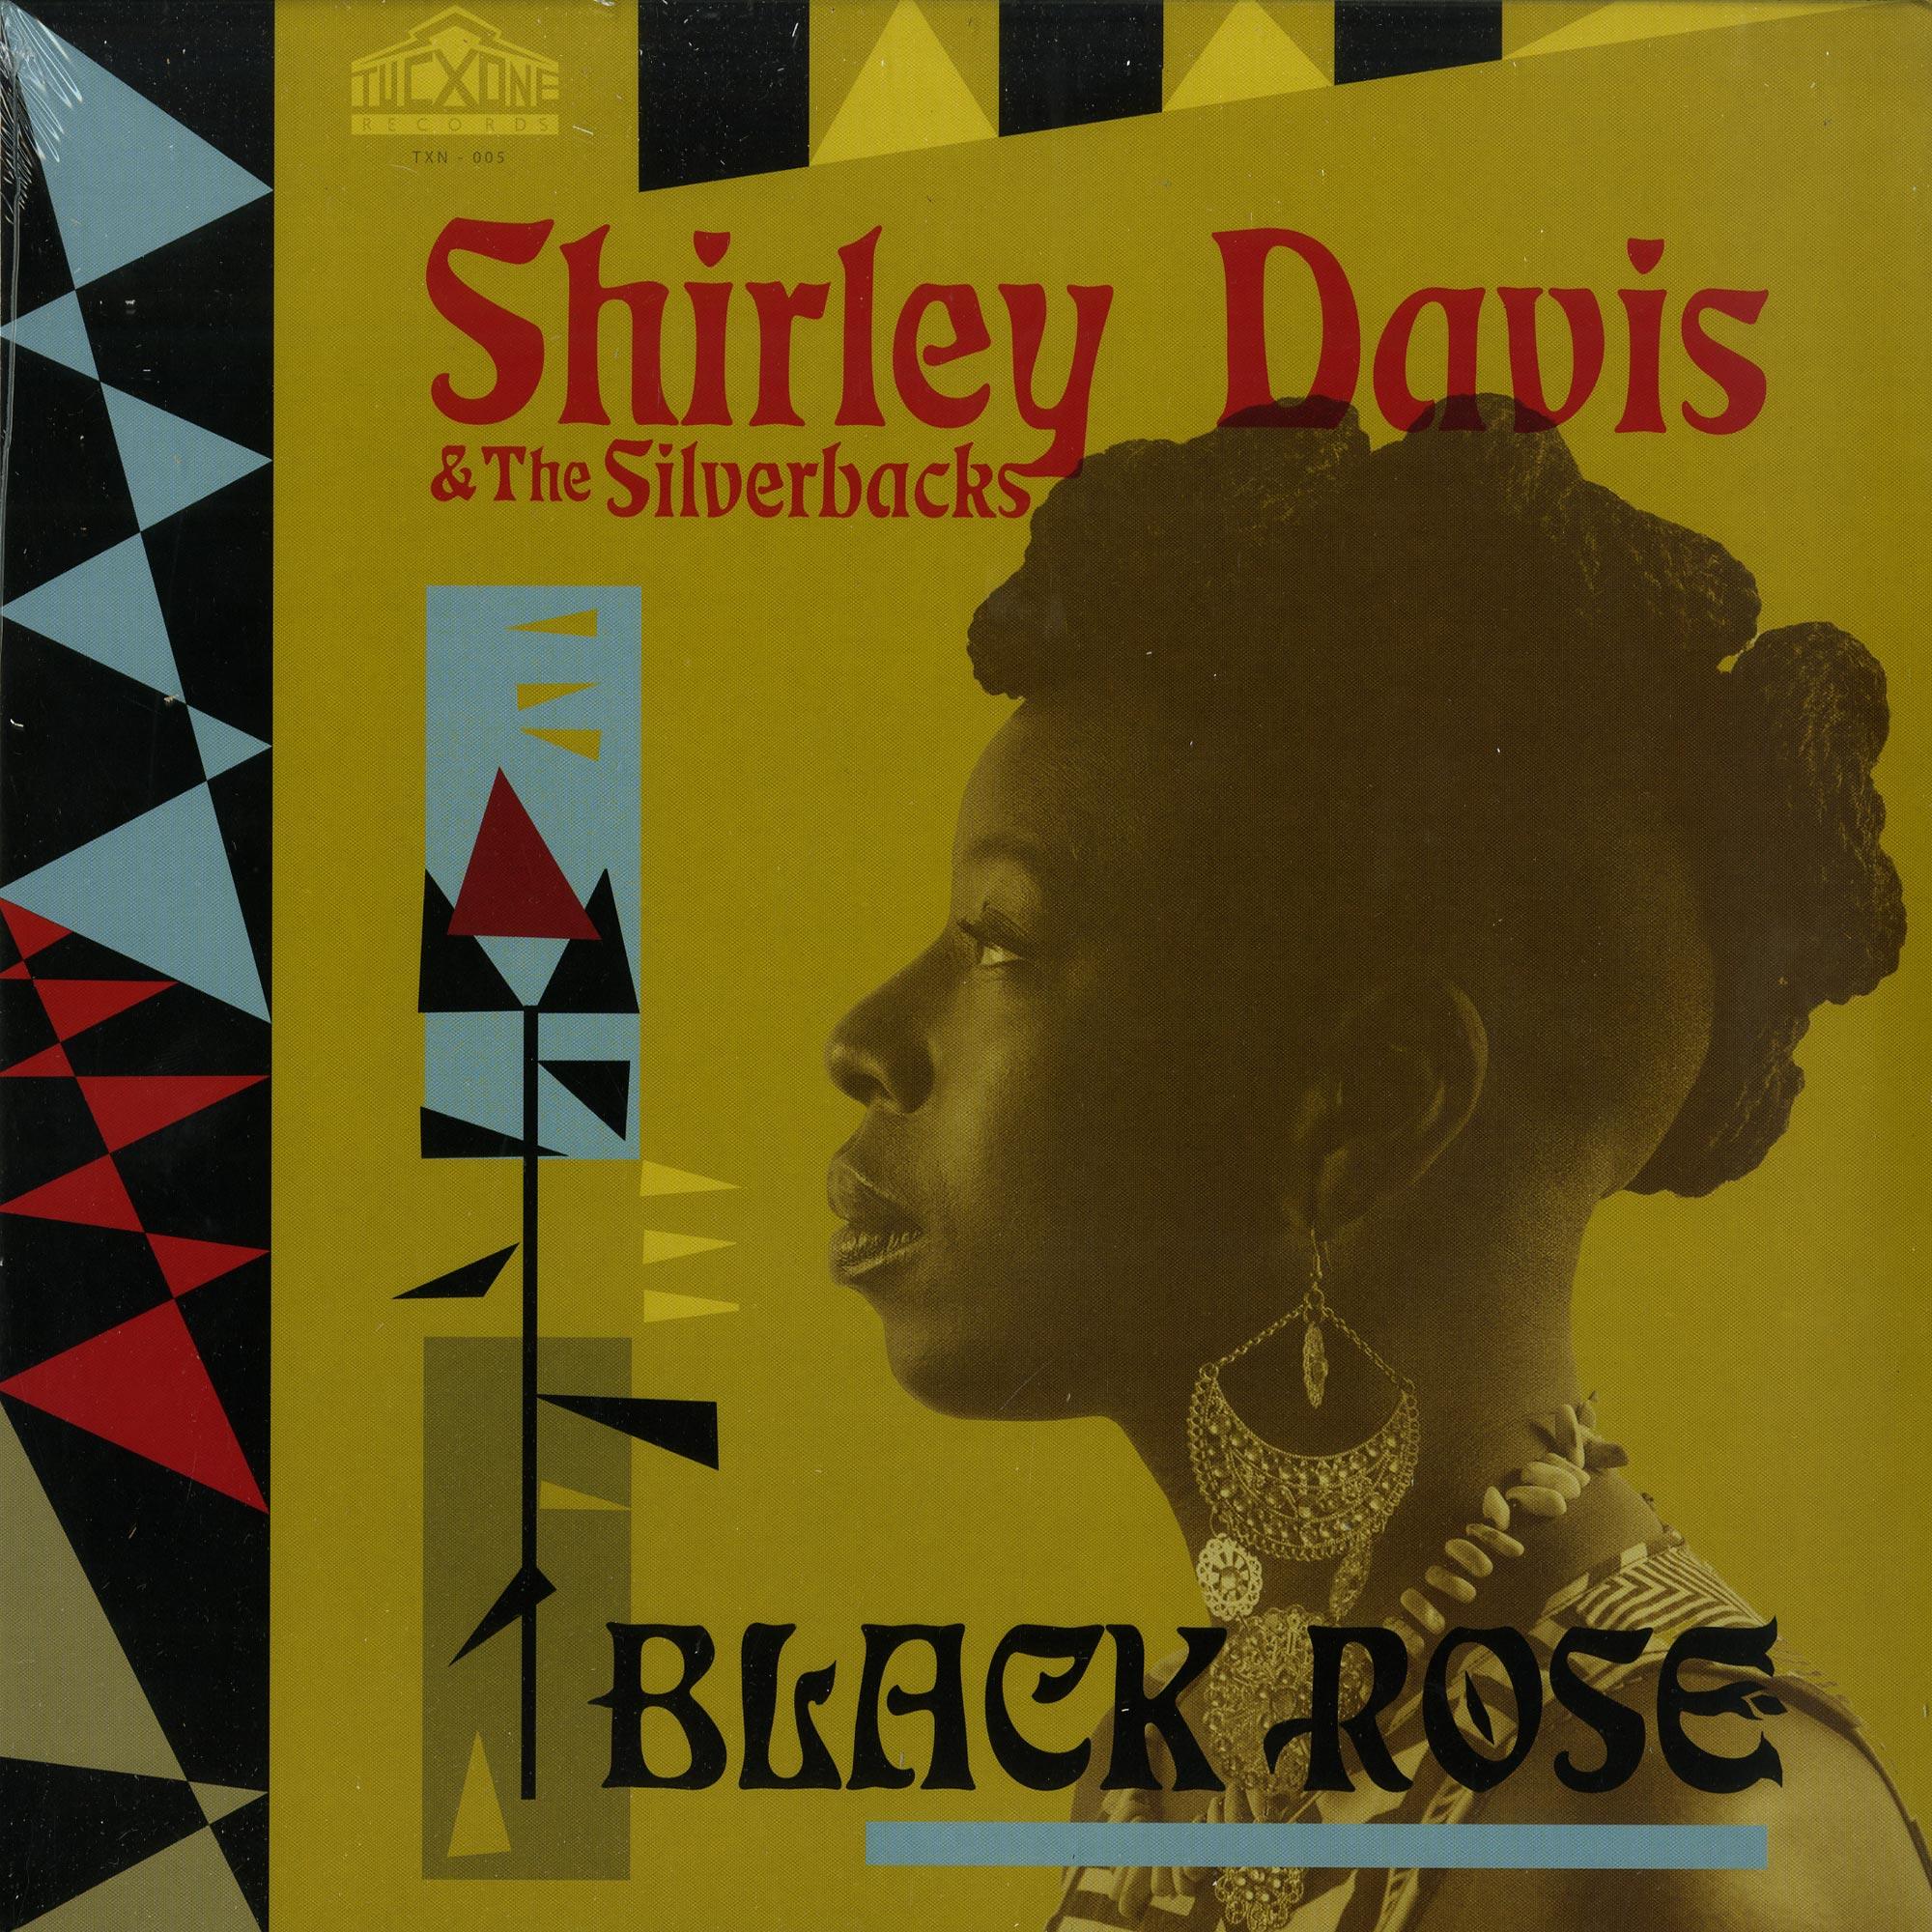 Shirley Davis & The Silverbacks - BLACK ROSE